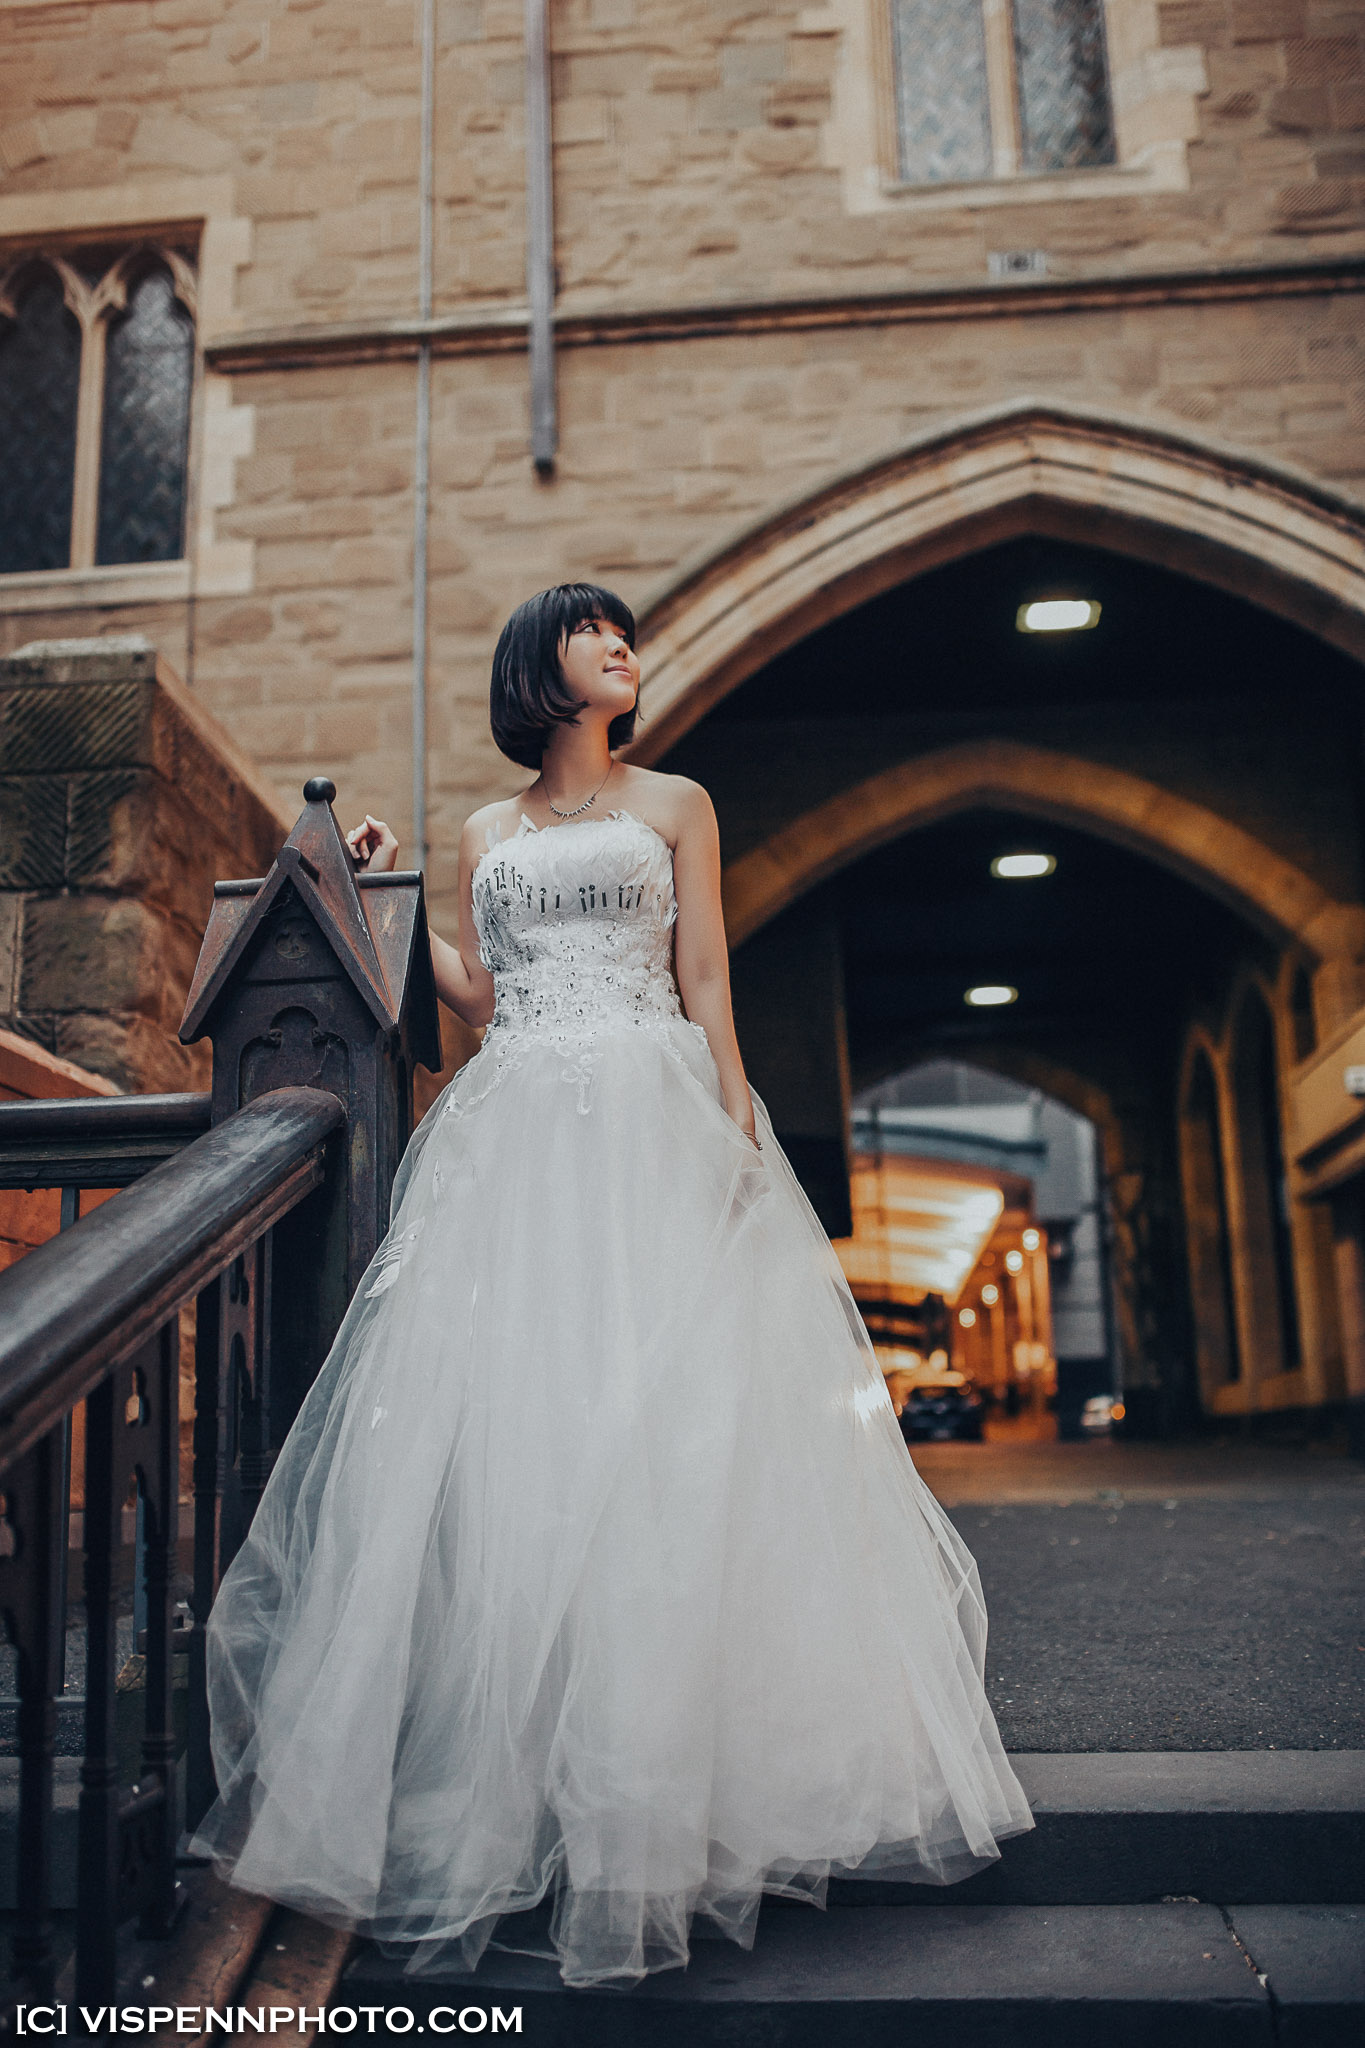 PRE WEDDING Photography Melbourne 5D3 7541